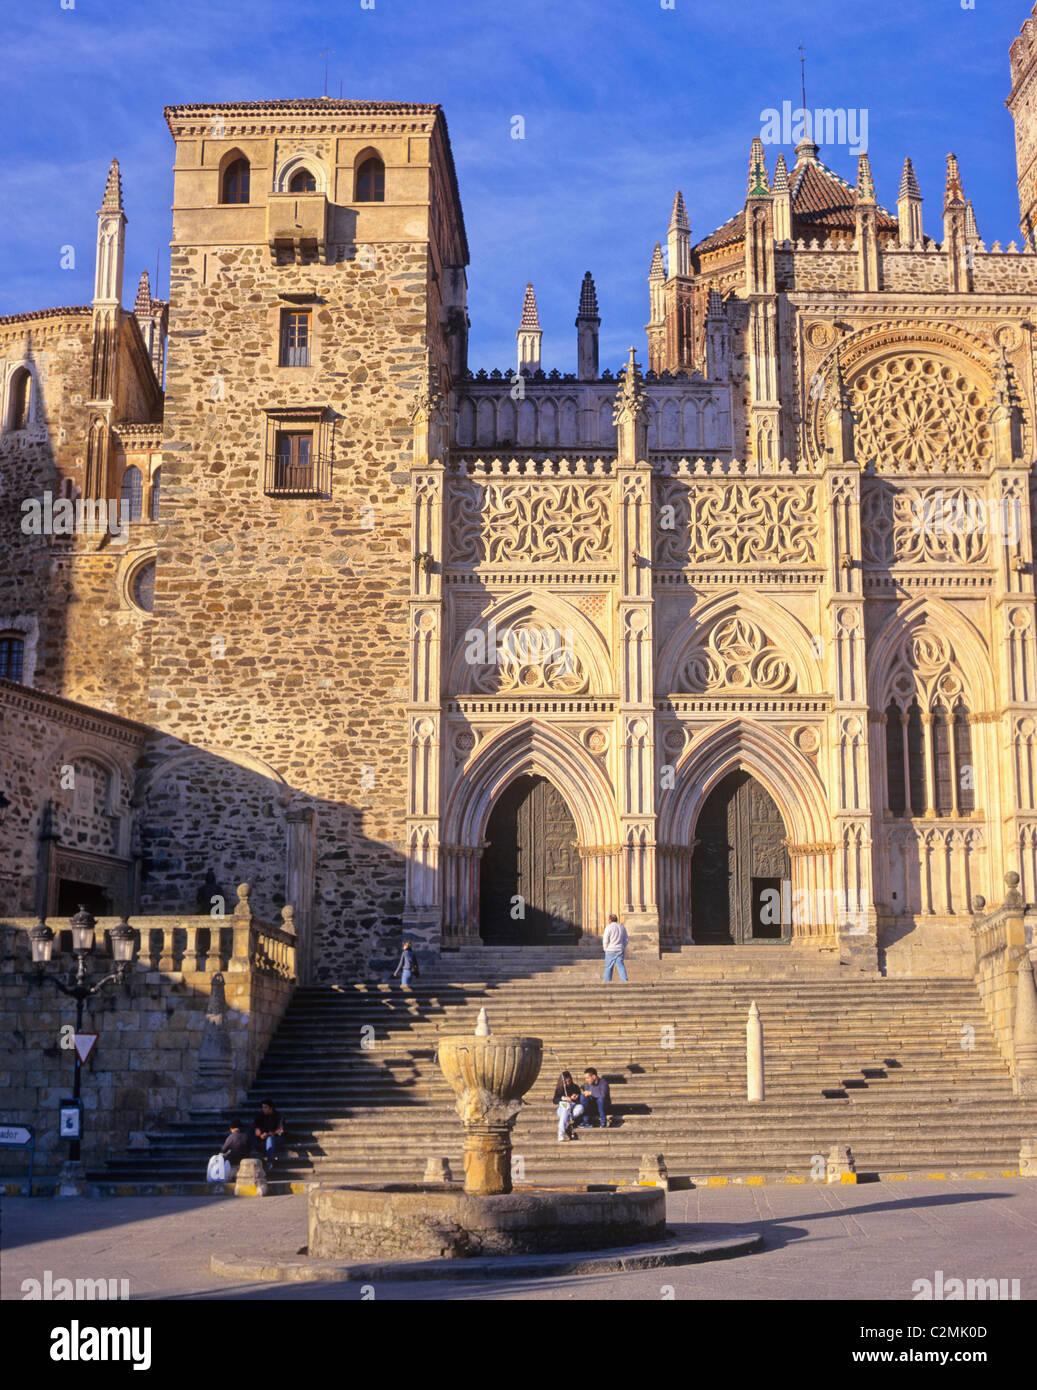 Extremadura, Guadelupe, 15th century cathedral and Monasterio de Santa Maria de Guadelupe. Stock Photo